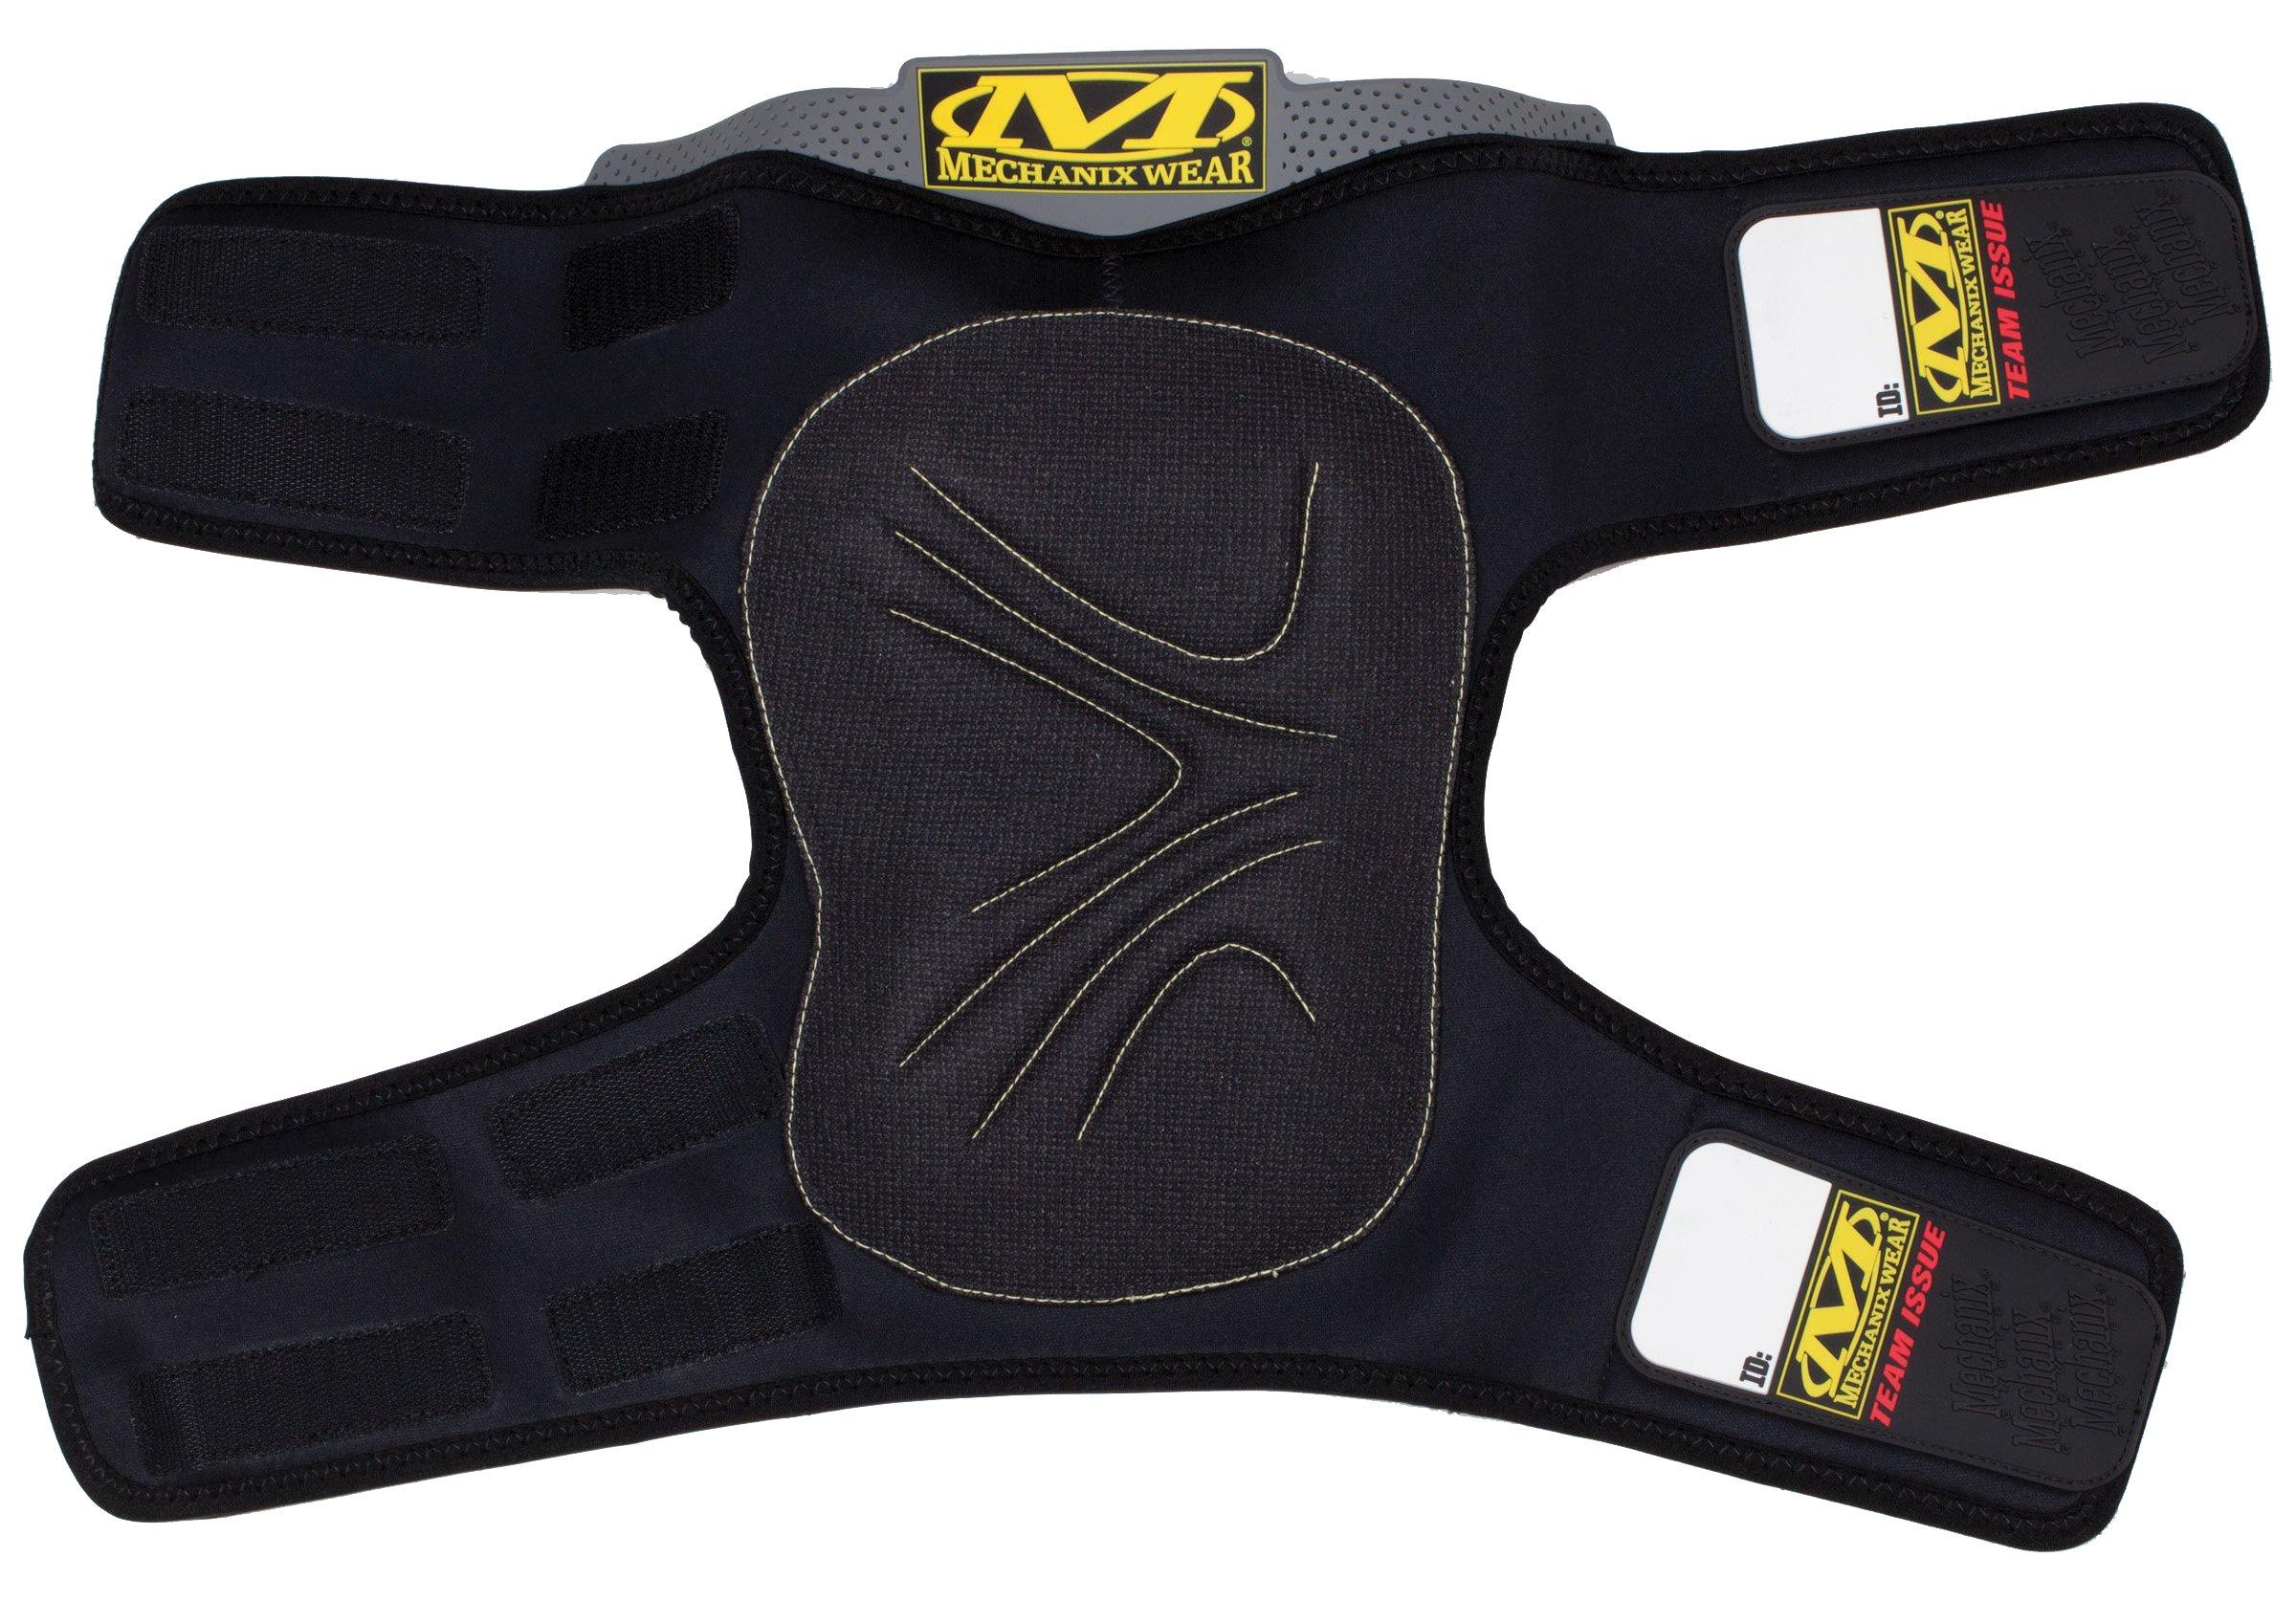 Mechanix Wear - Team Issue Knee Pads (One Size, Black)